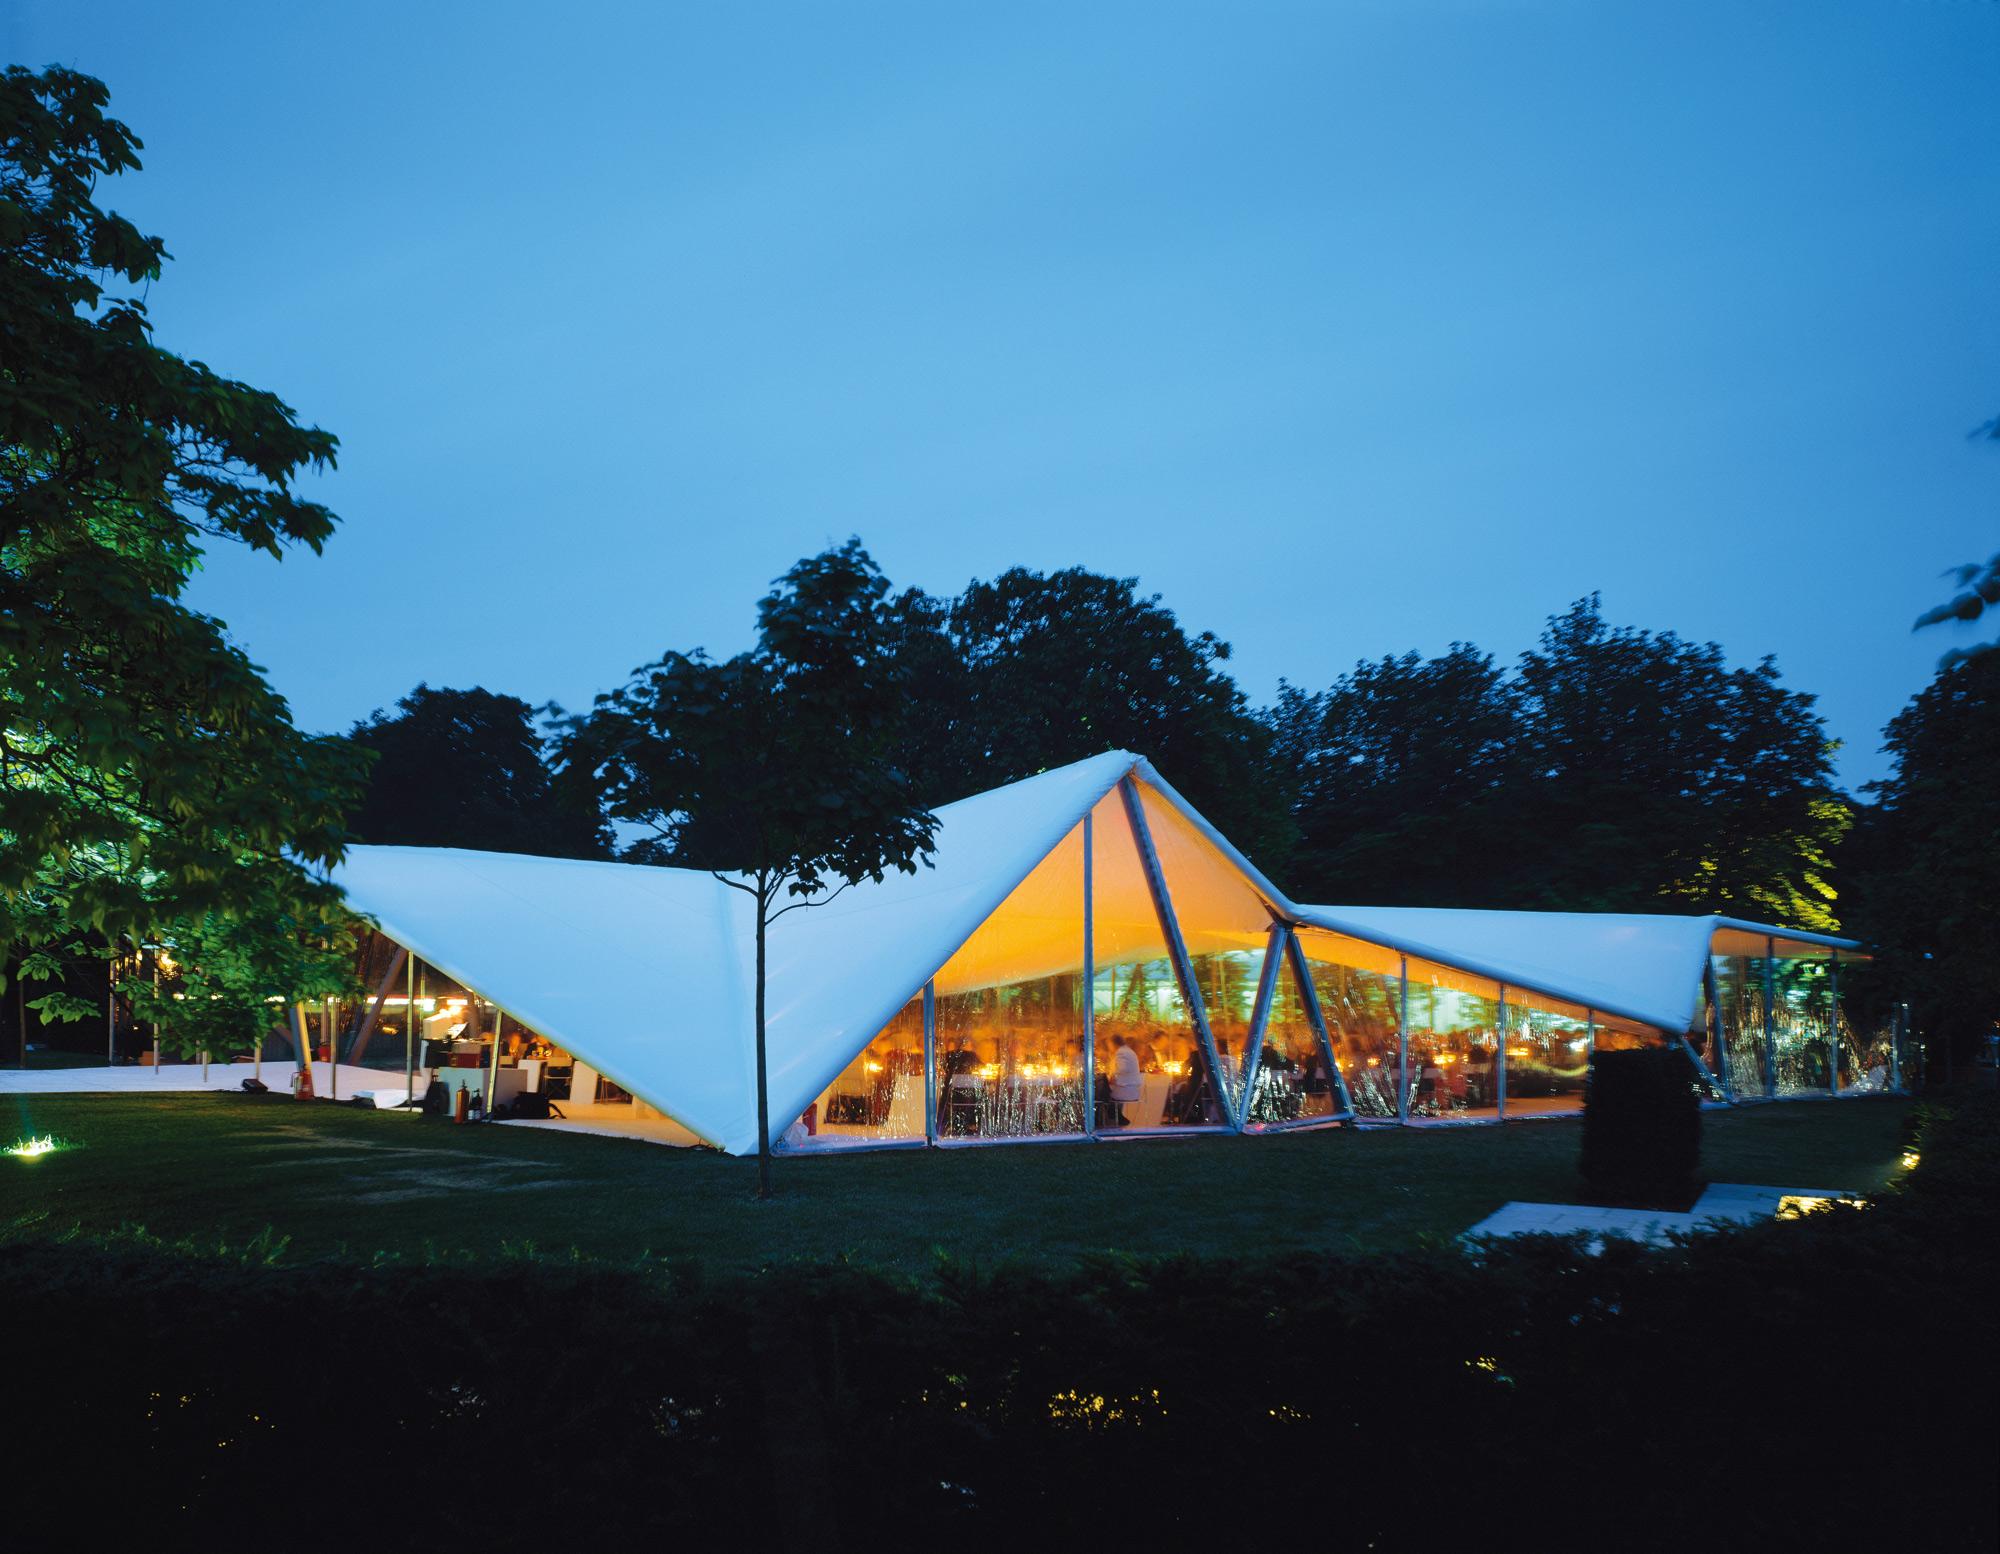 Image 1 of 34 | Serpentine Gallery Pavilion 2000 by Zaha Hadid